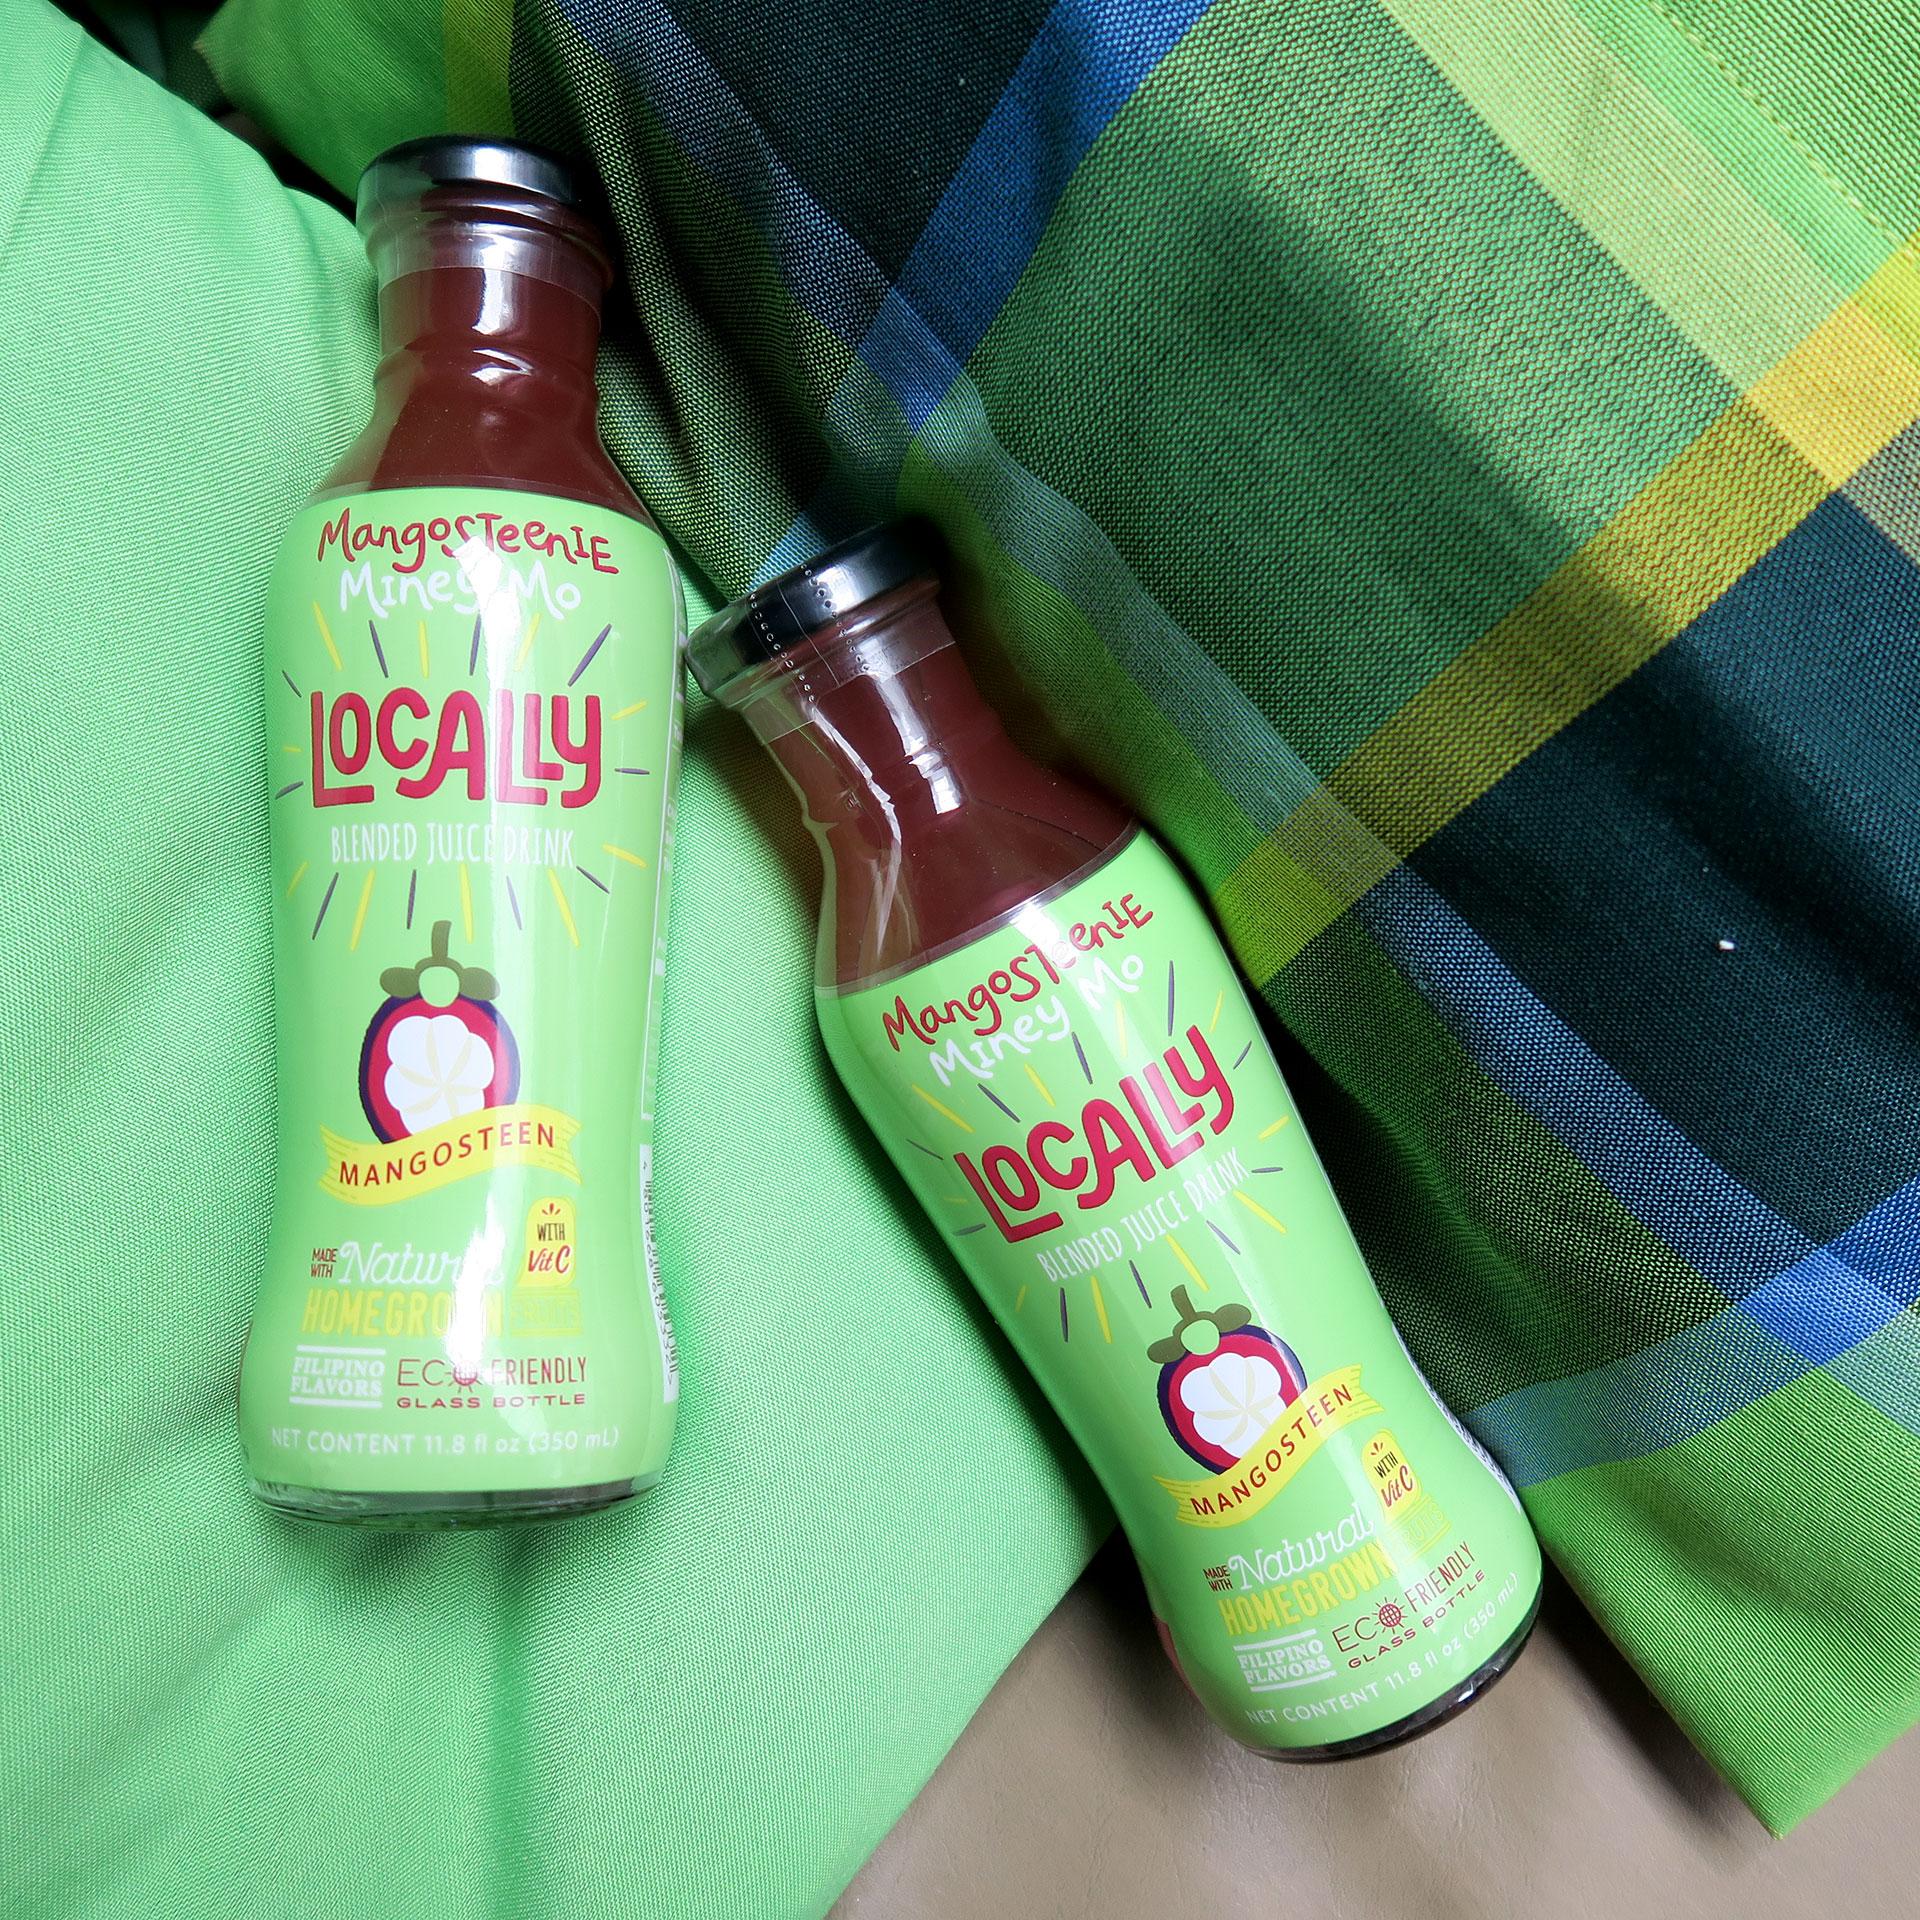 9 Locally Blended Juice Drink Review Photos - Gen-zel She Sings Beauty